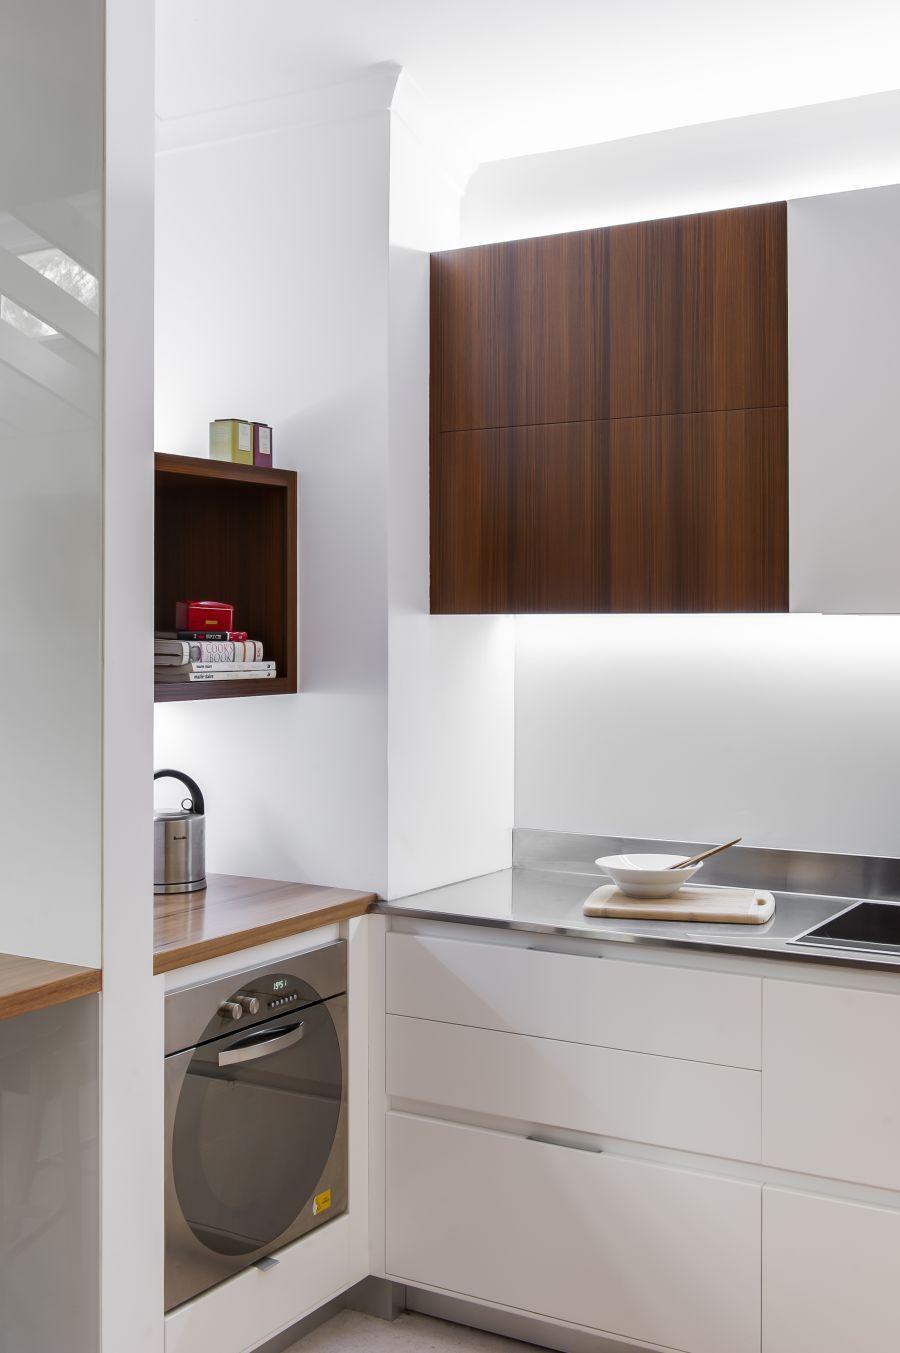 34 Practical Ideas For Kitchen Office Kitchenette Kitchen Design Gallery Small Office Kitchen Design Ideas